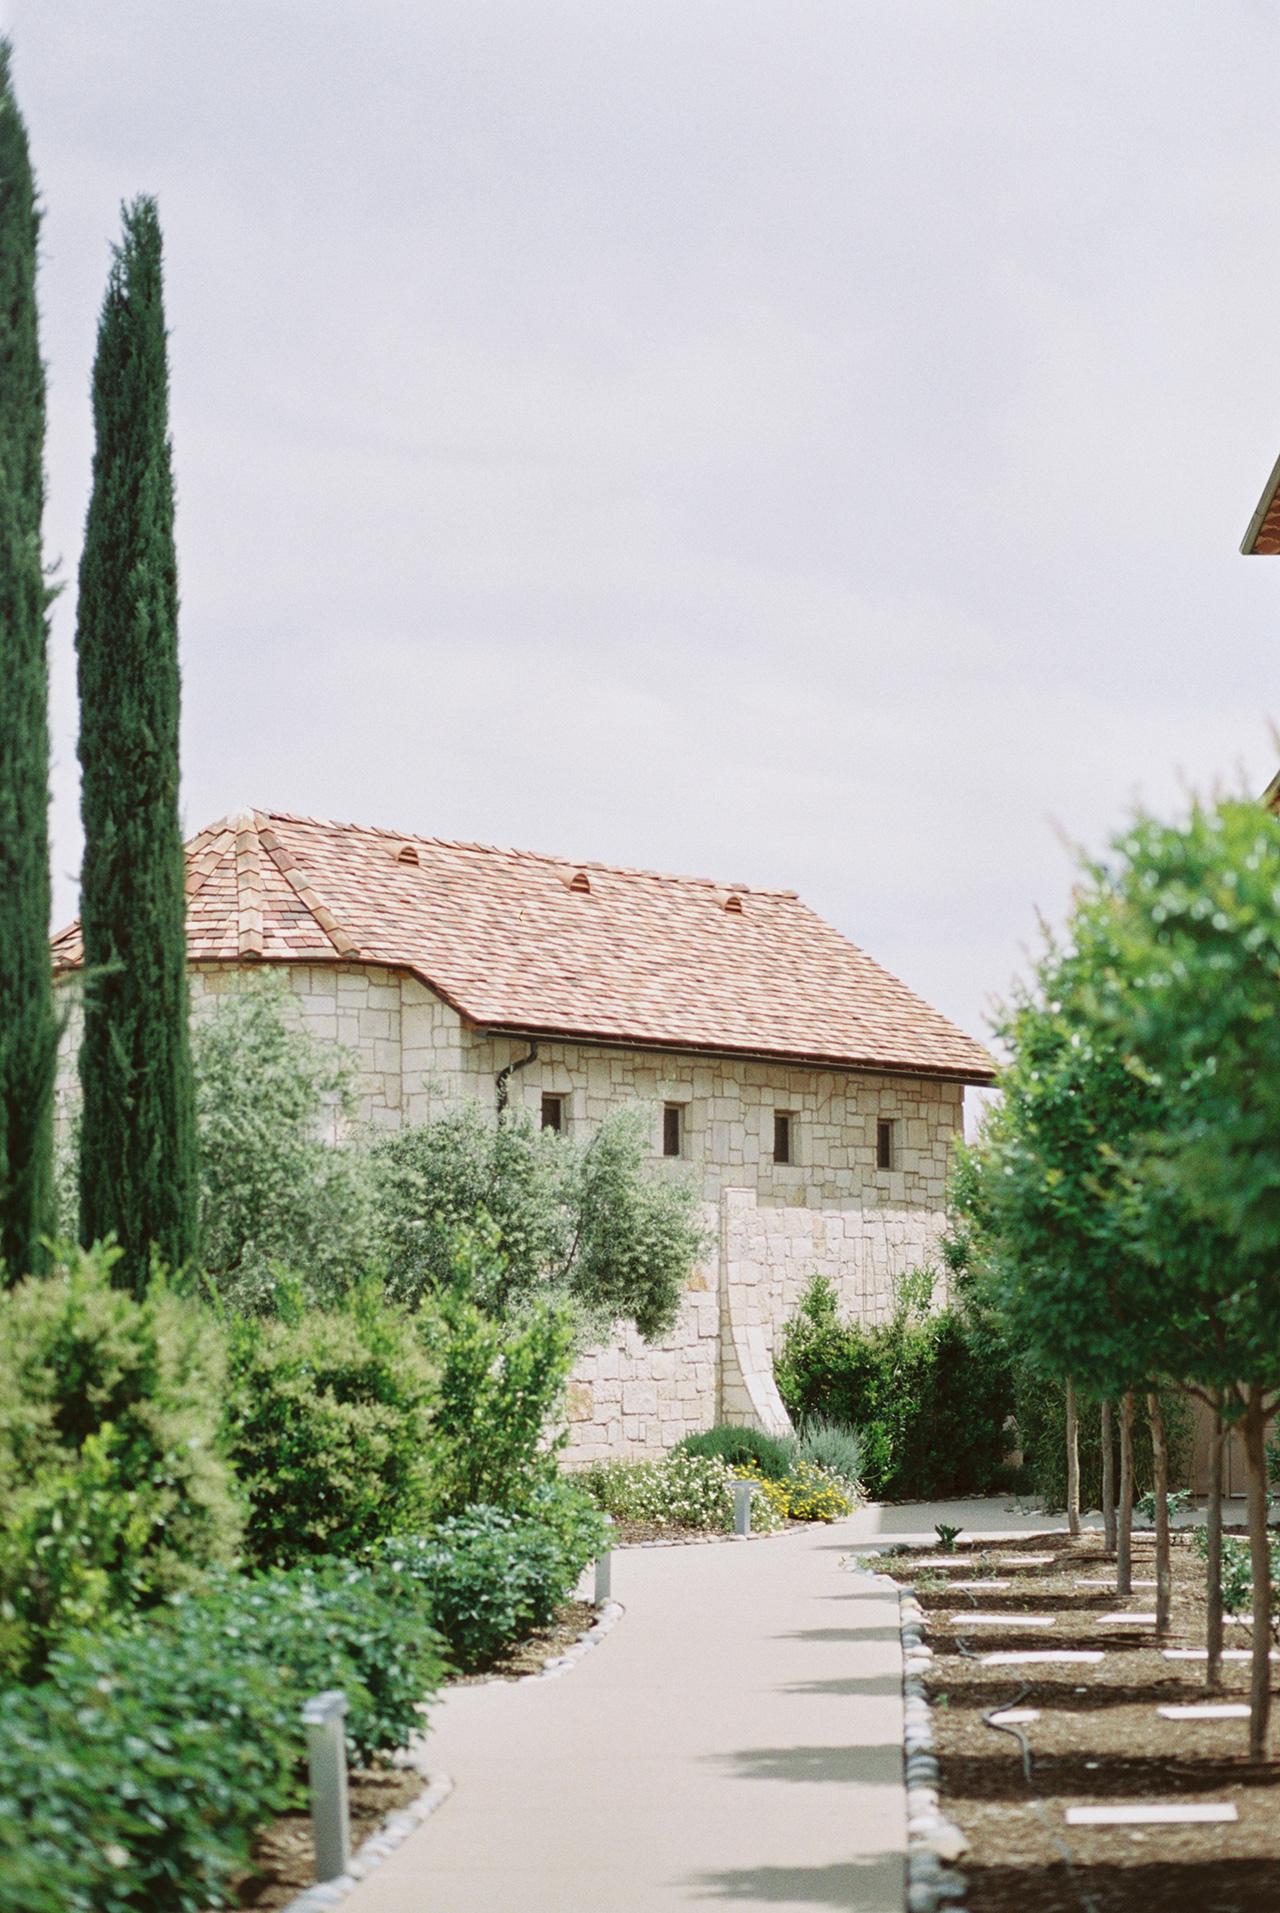 vineyard resort sidewalk and gardens to building